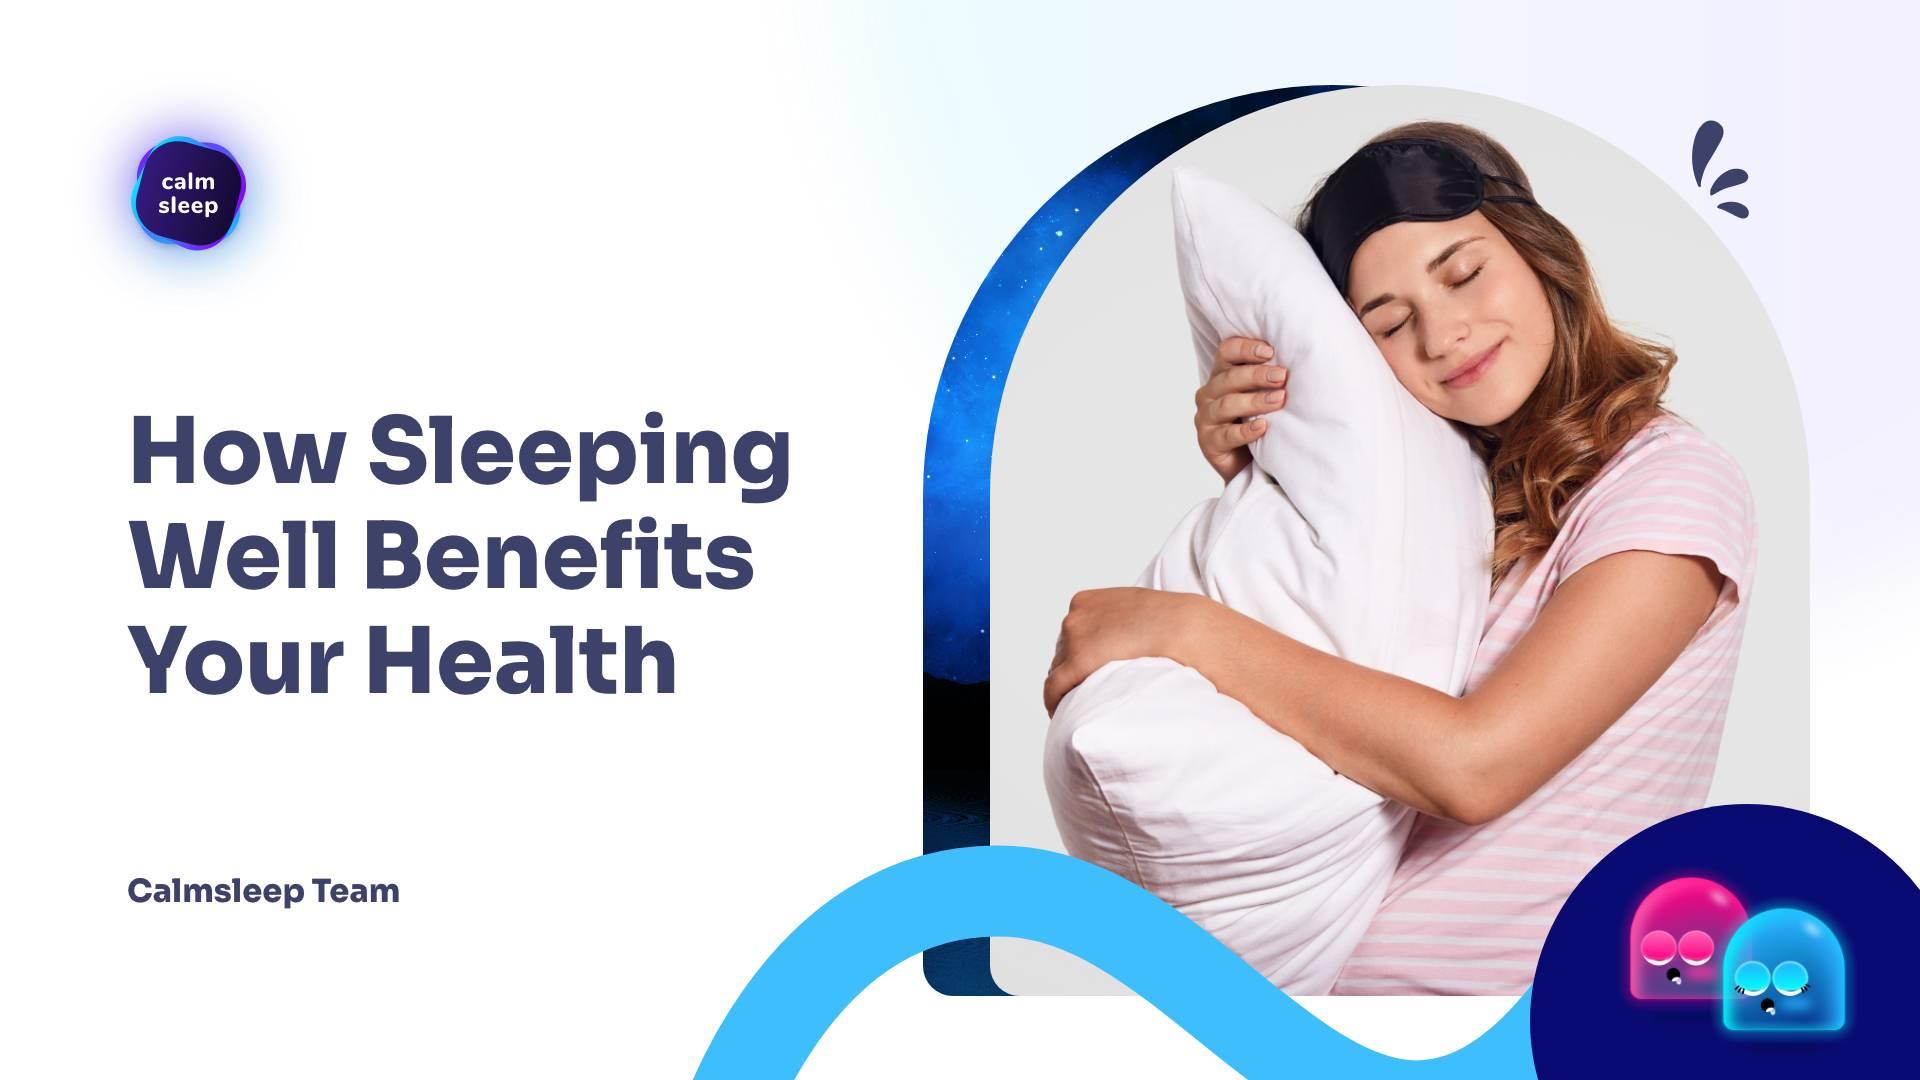 How Sleeping Well Benefits Your Health